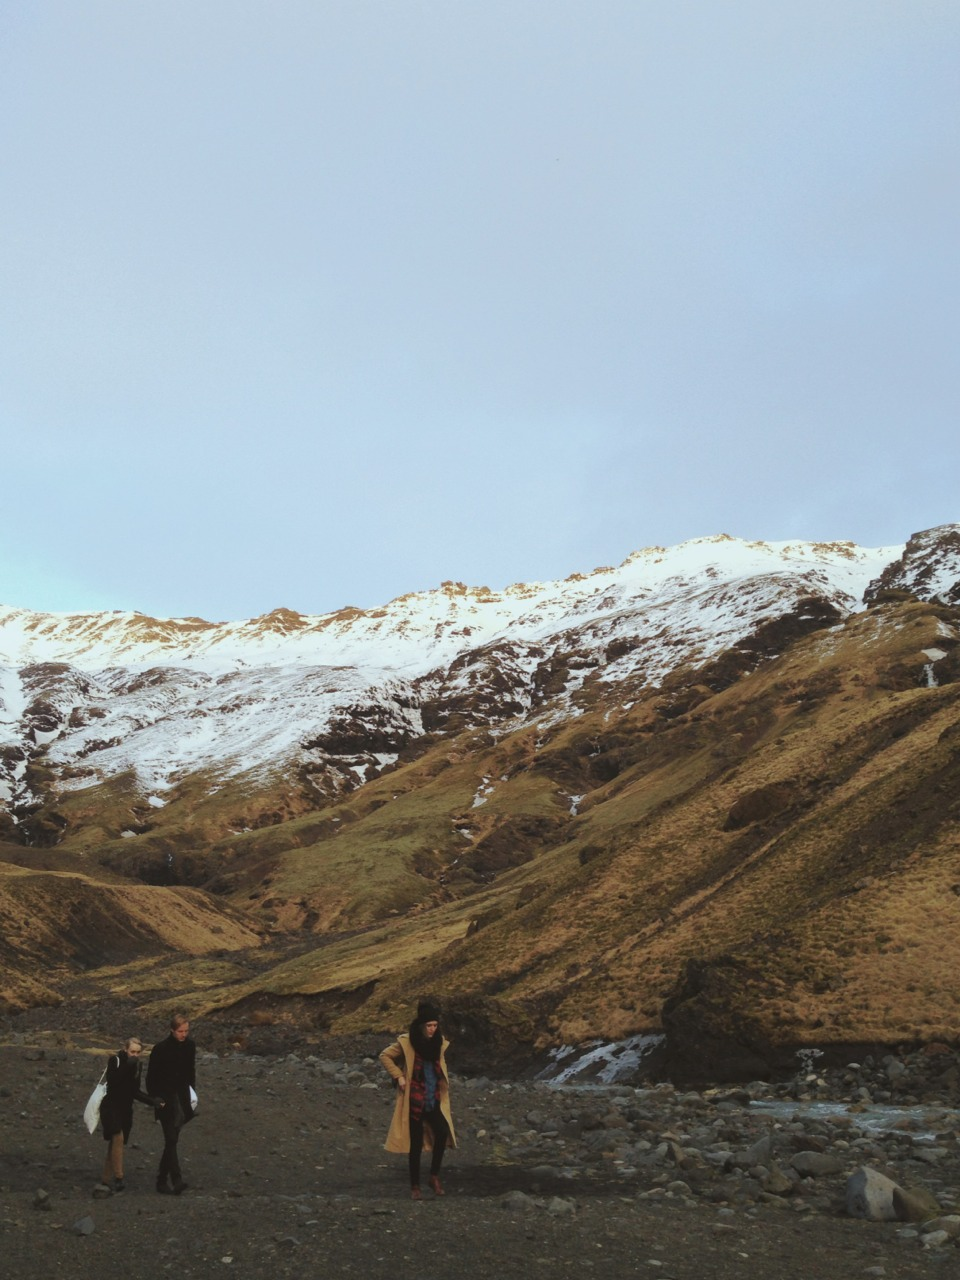 mono1984: Exploring Iceland with Kinfolk